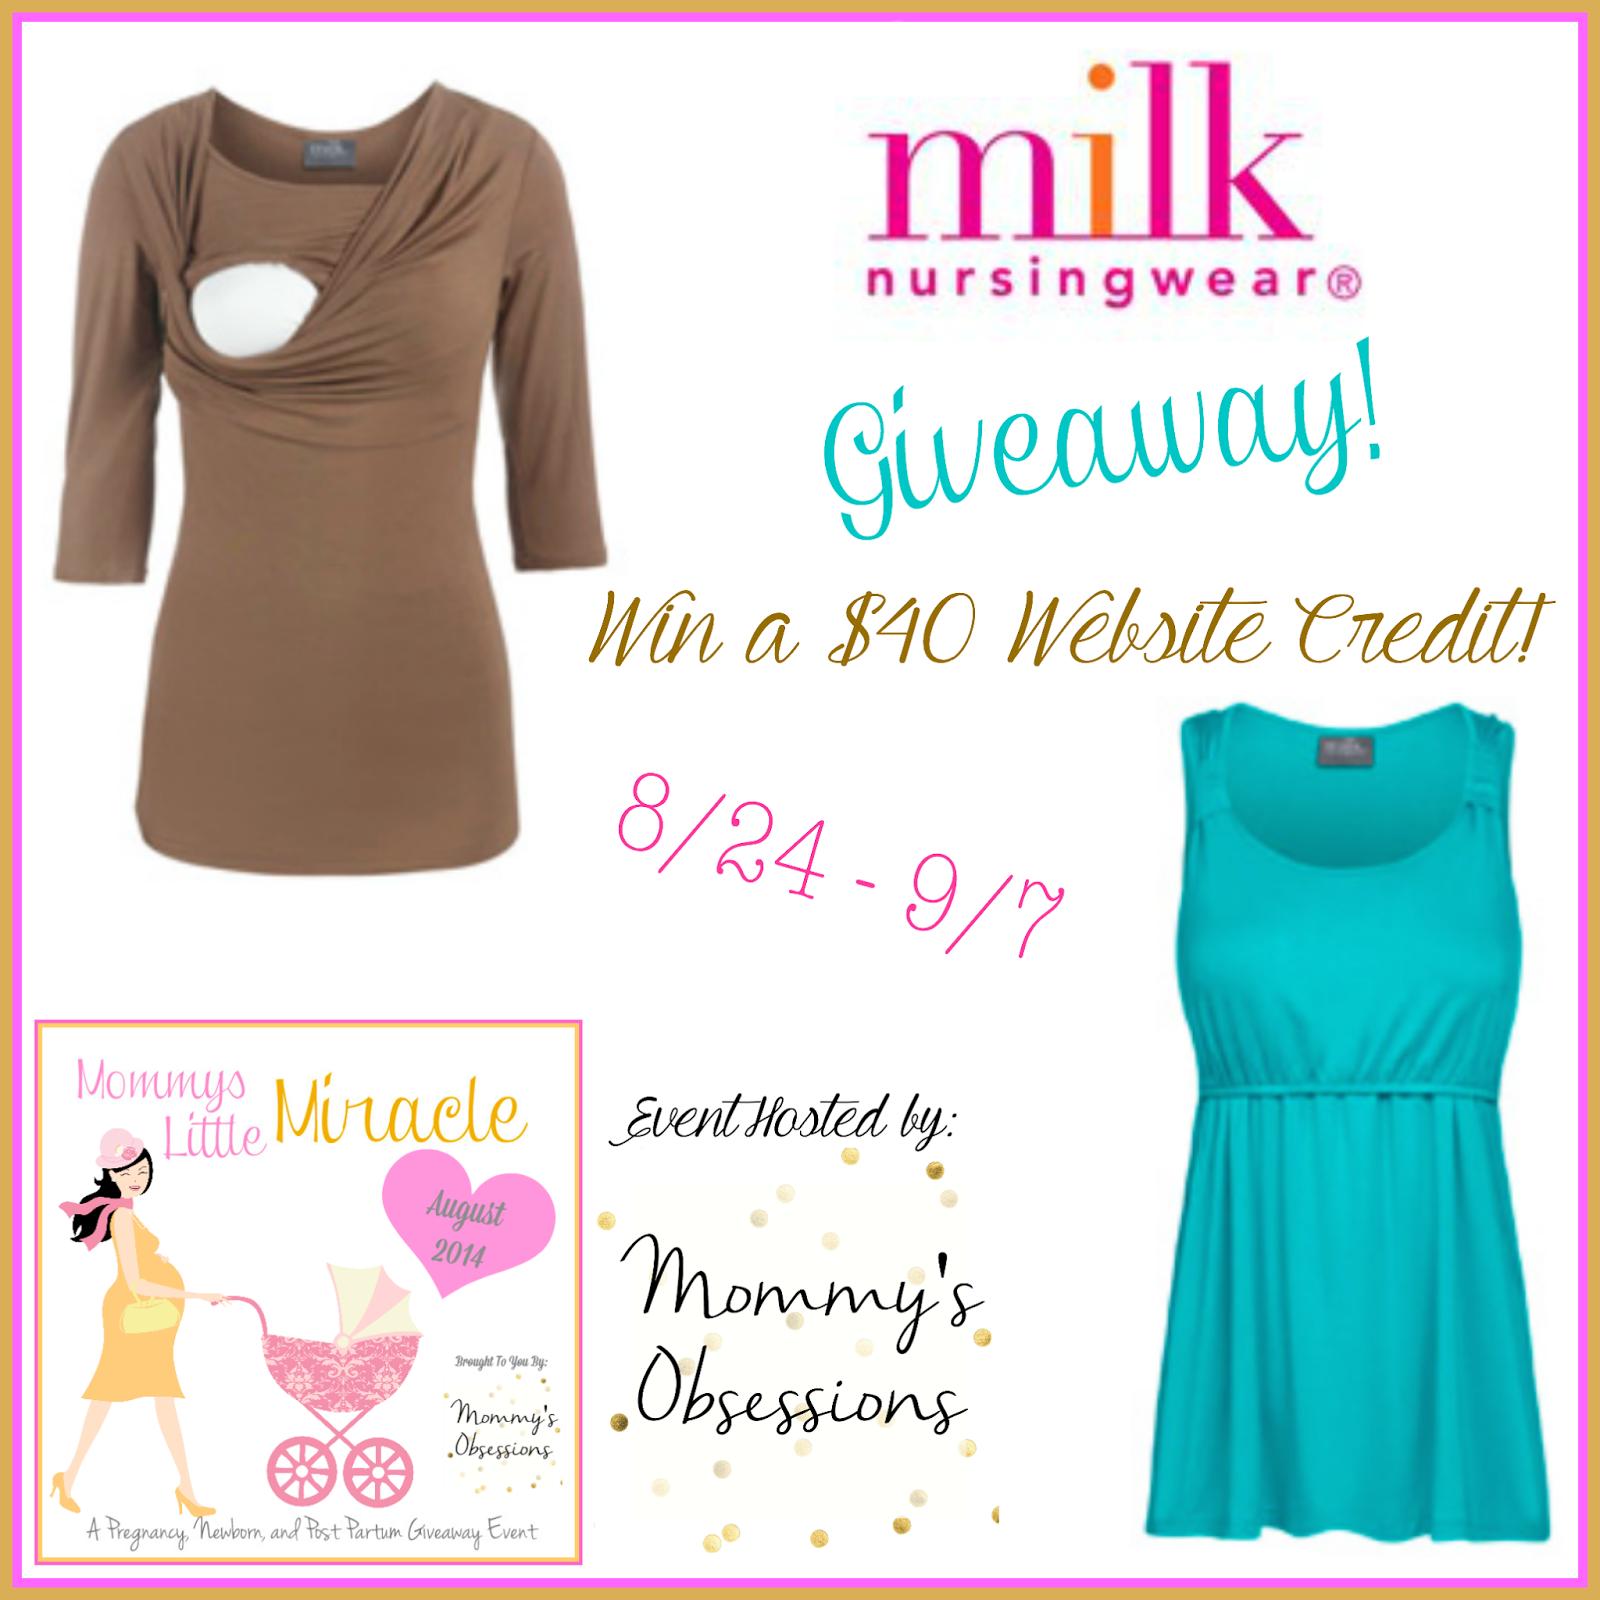 Milk Nursingwear